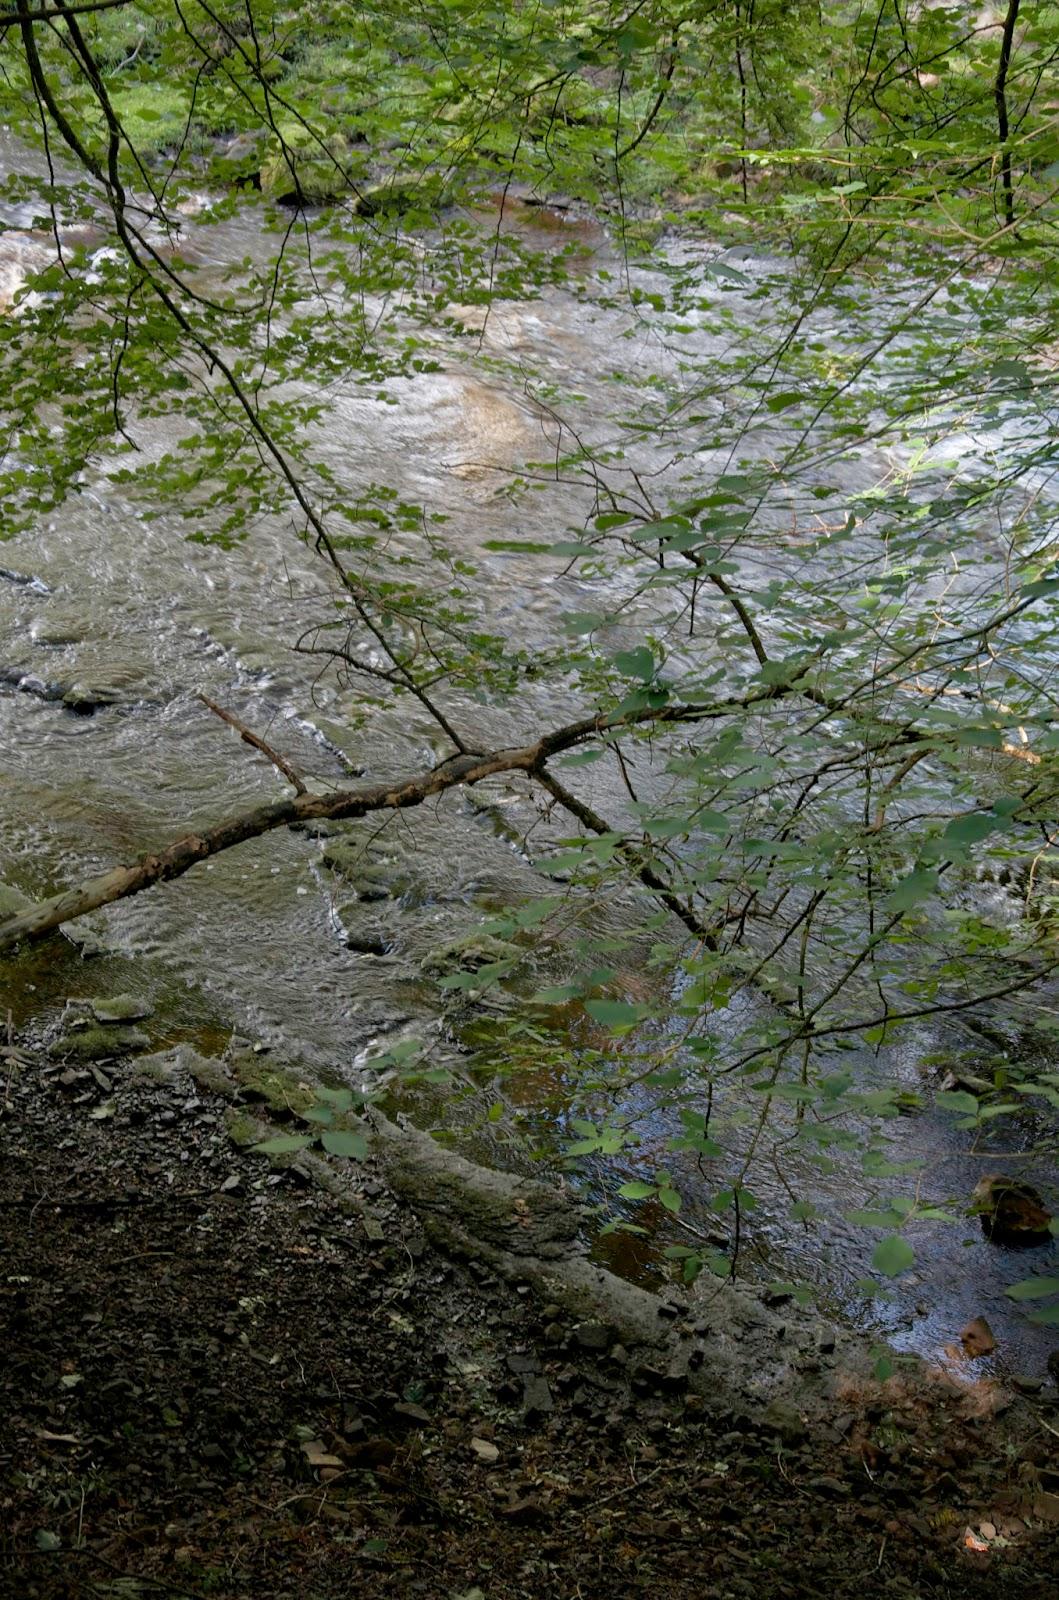 Robert ketchell 39 s blog even eden ebbs and flows River flowing from the garden of eden